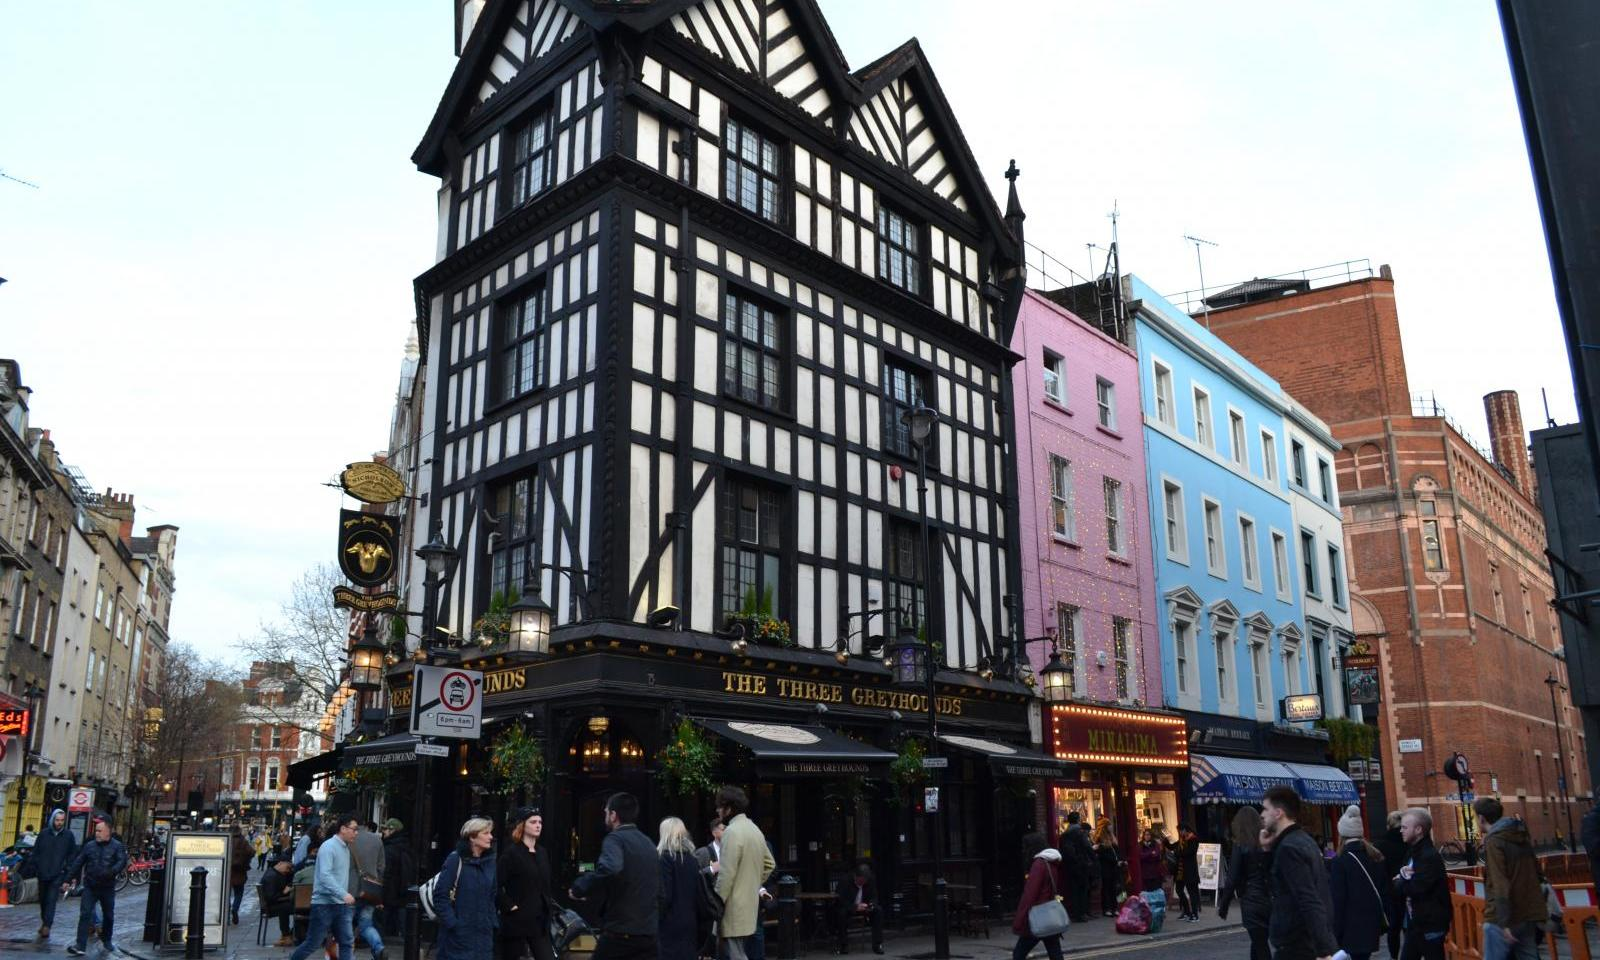 London bordell